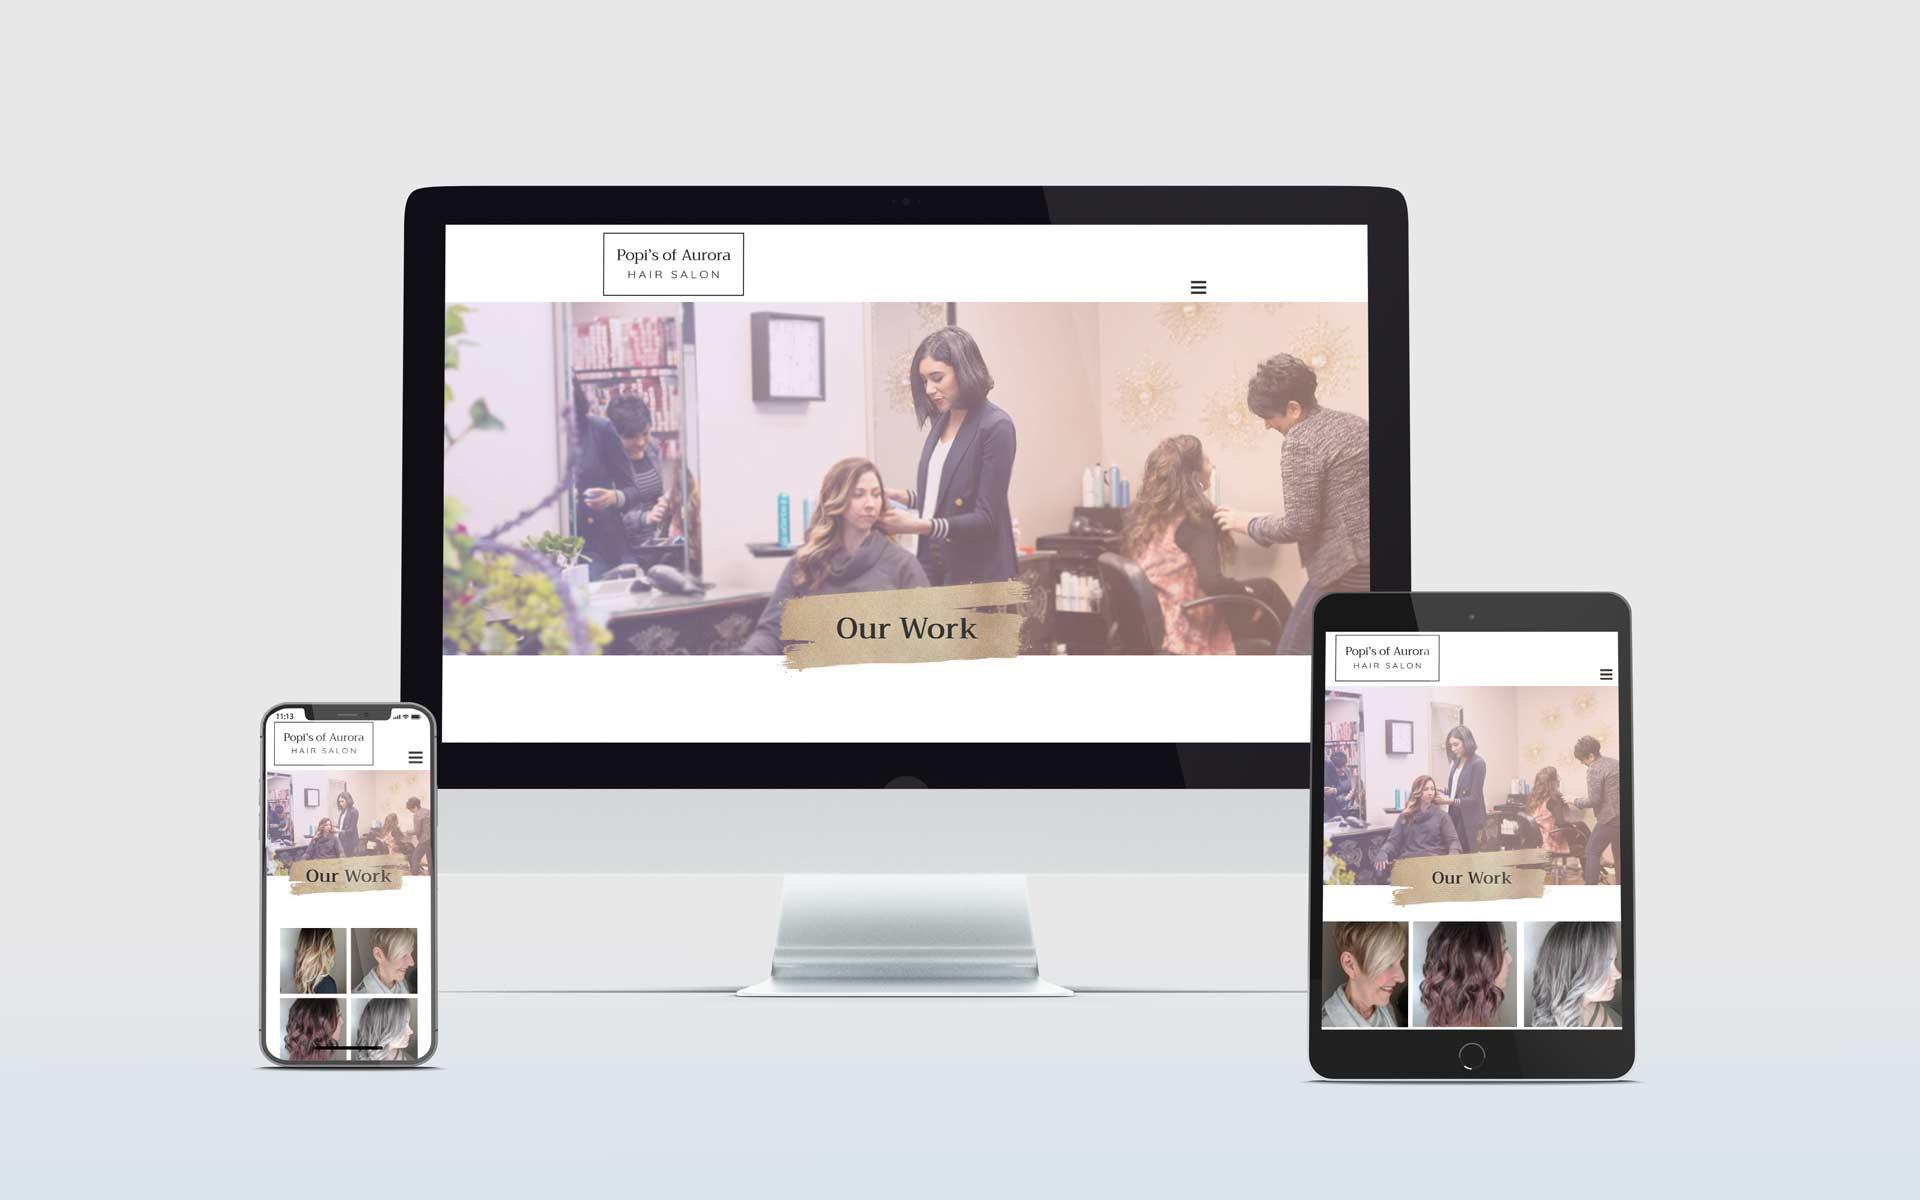 Popi's of Aurora Hair Salon Website Redesign